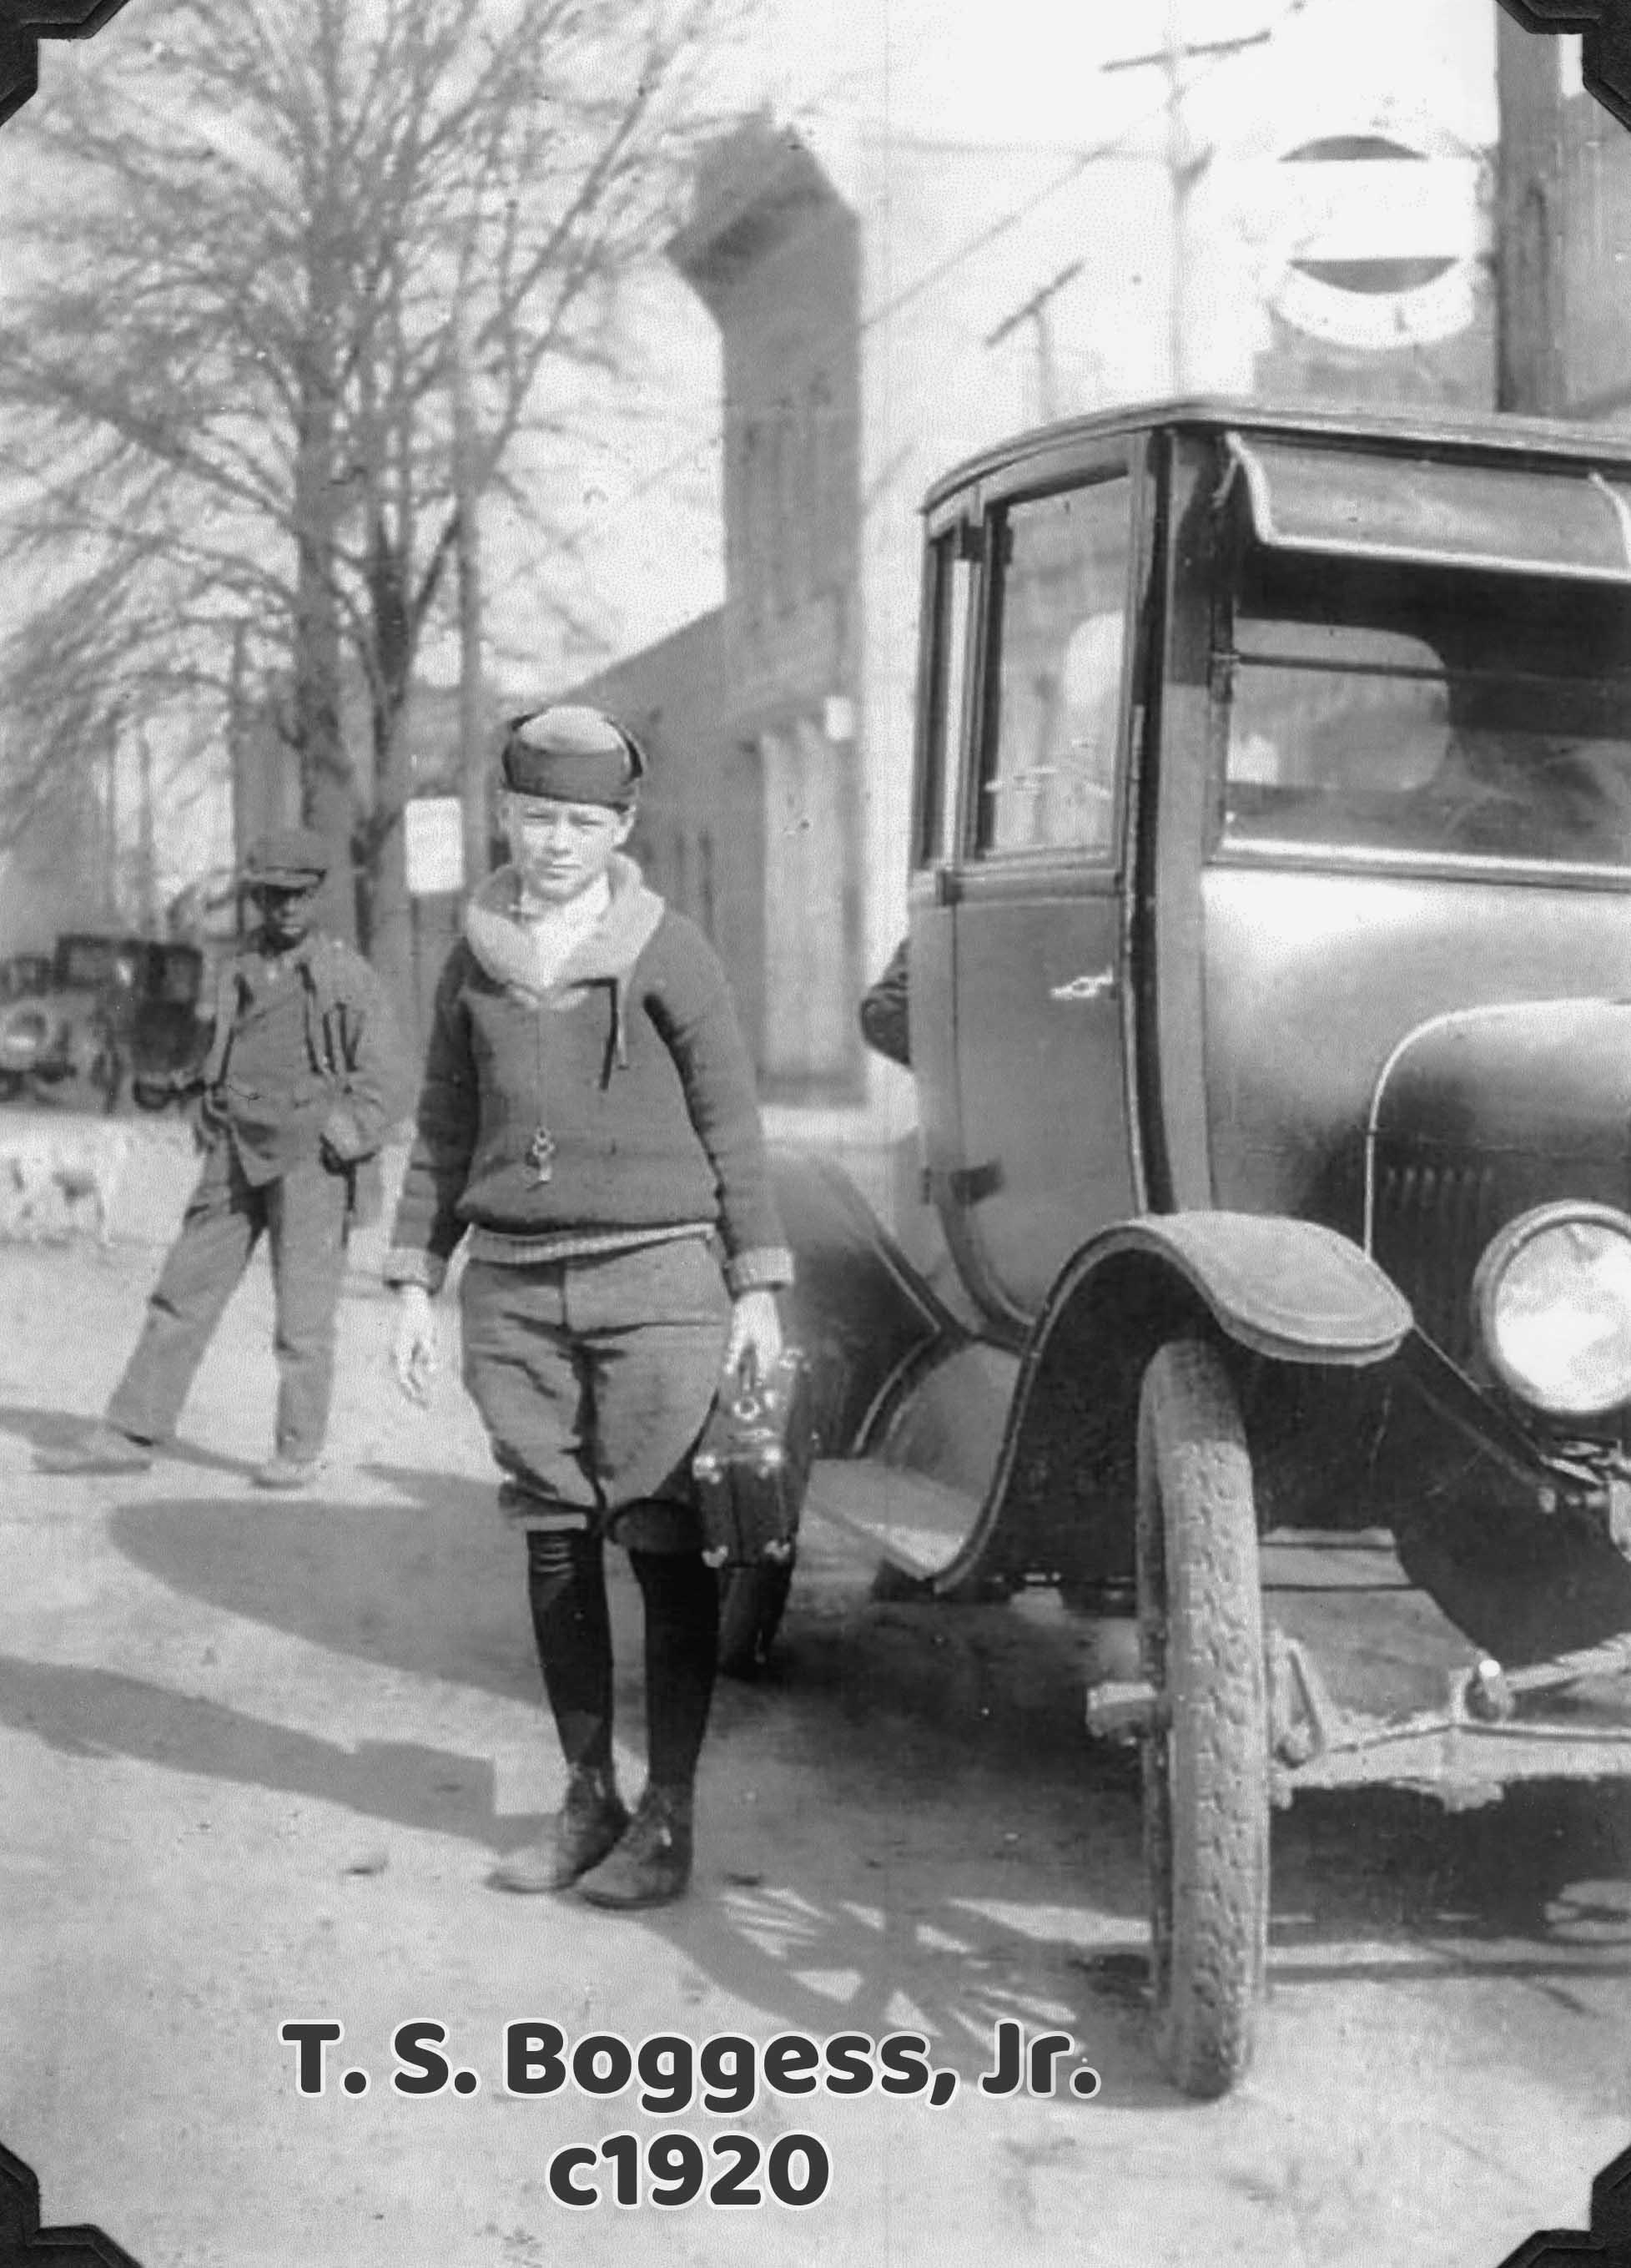 Thomas Shelton Boggess, Jr. circa 1920 with Clarinet